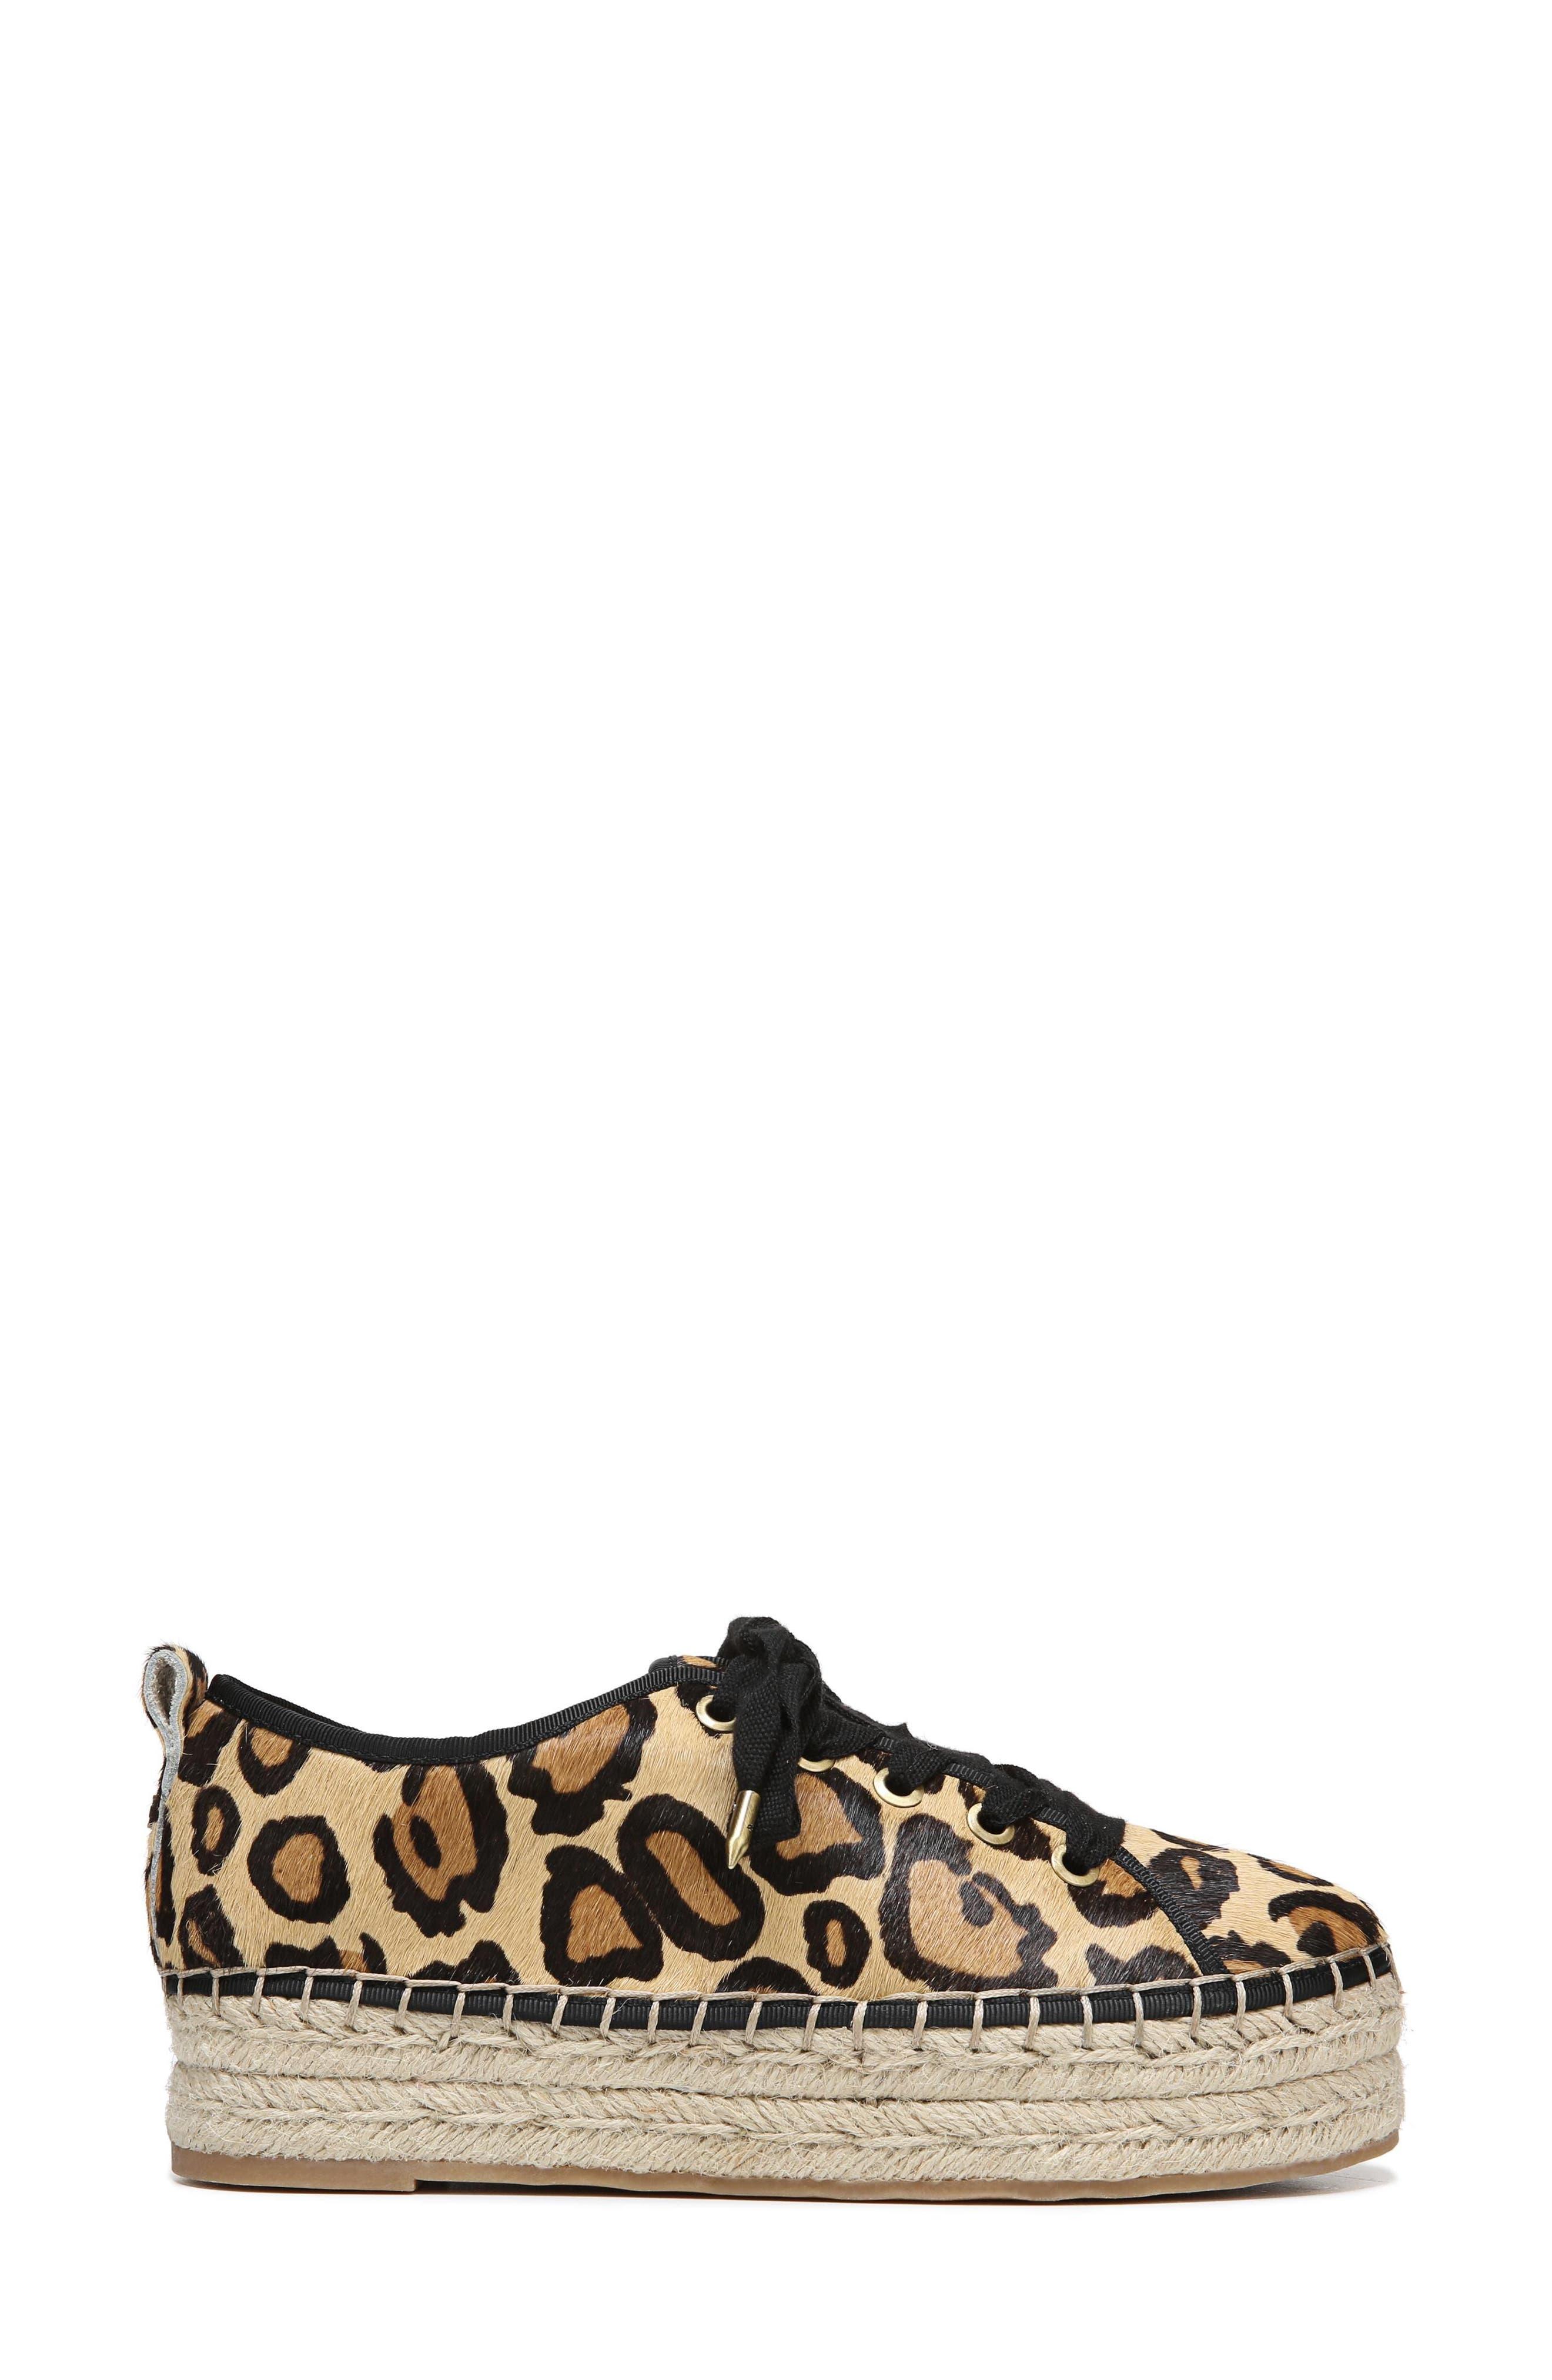 Celina Genuine Calf Hair Espadrille Flat,                             Alternate thumbnail 3, color,                             New Nude Leopard Brahma Hair